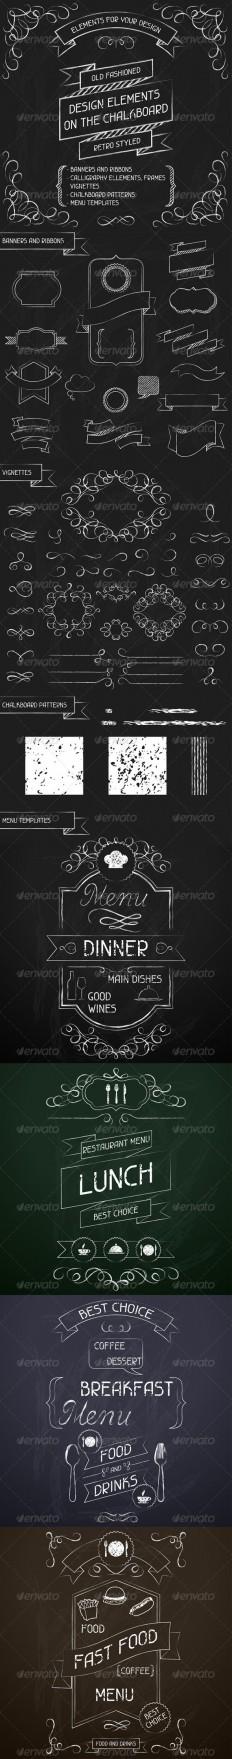 Design Elements on the Chalkboard - Decorative Symbols Decorative | Wedding Misc | Pinterest